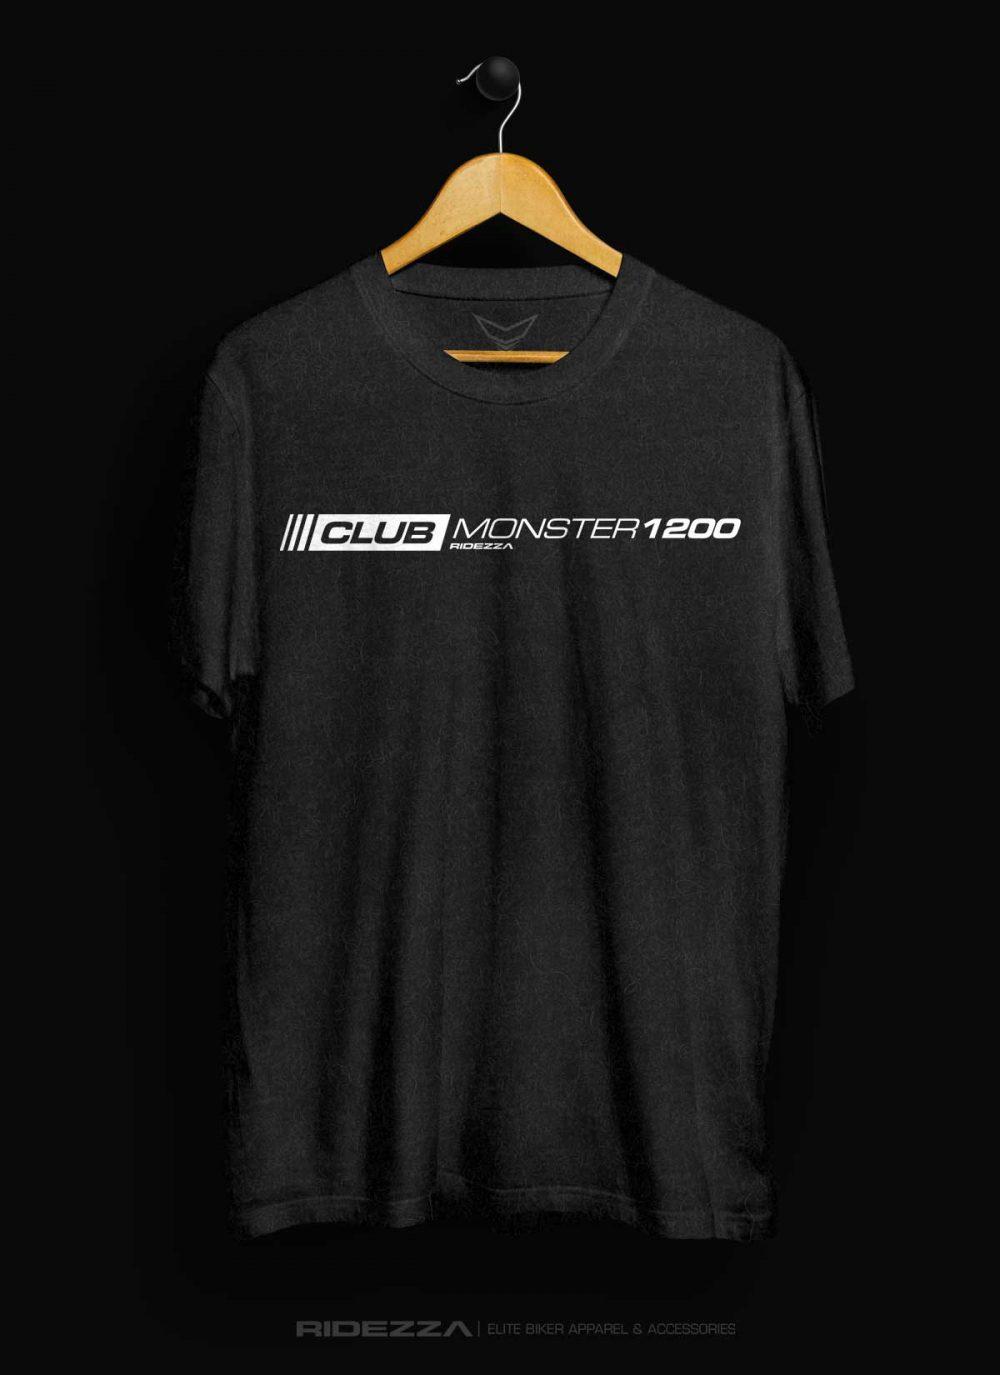 Ducati Monster 1200 Club T-Shirt